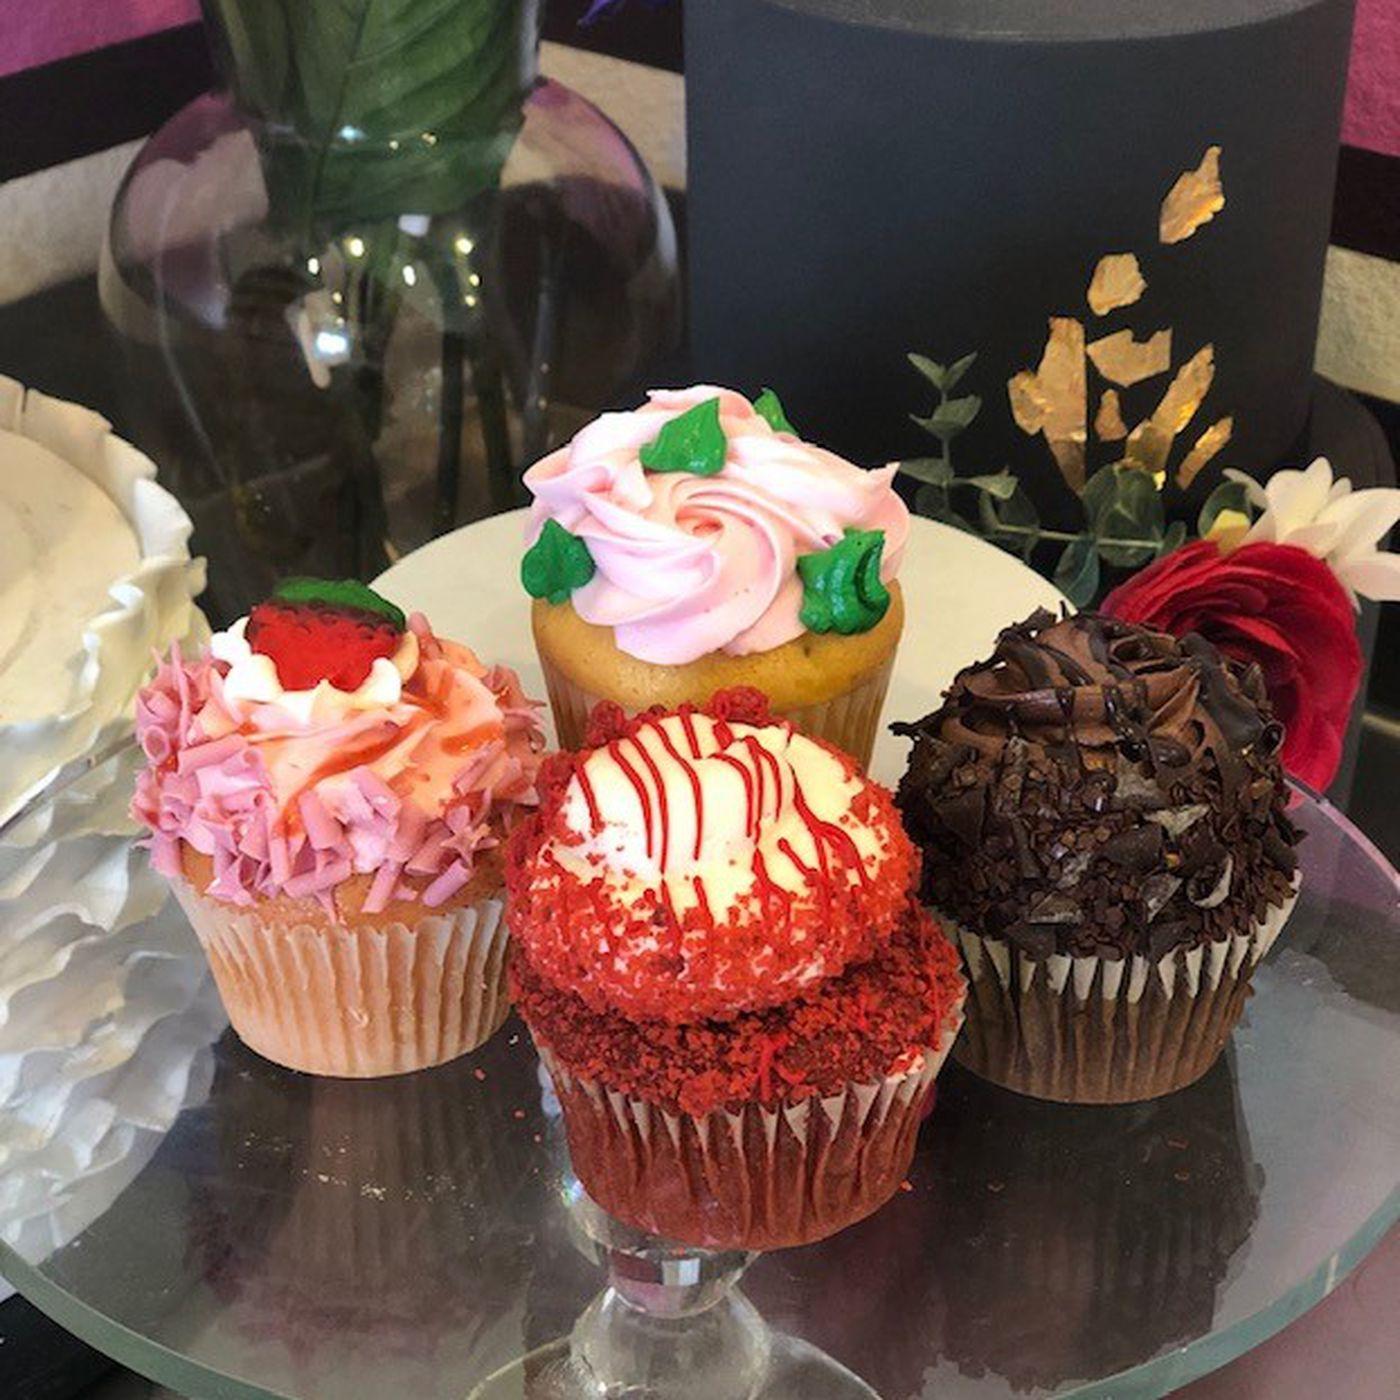 Surprising Caked Las Vegas Cupcake Shop Opens On The Westside Eater Vegas Birthday Cards Printable Benkemecafe Filternl